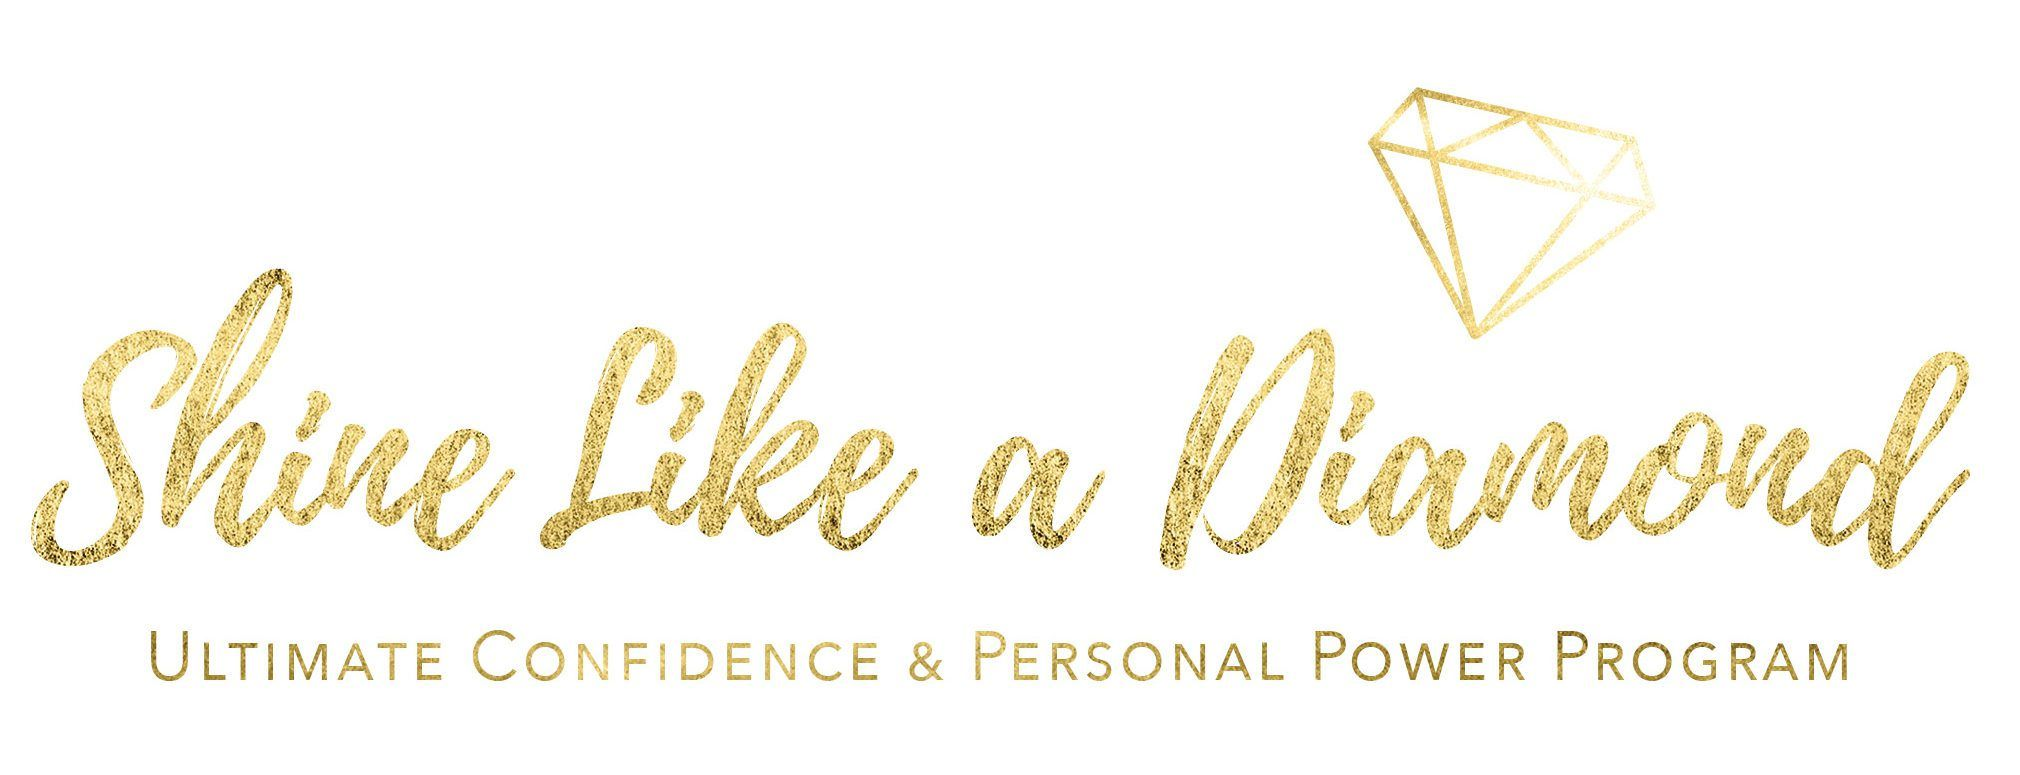 shine like a diamond Confidence Personal Power Pogram